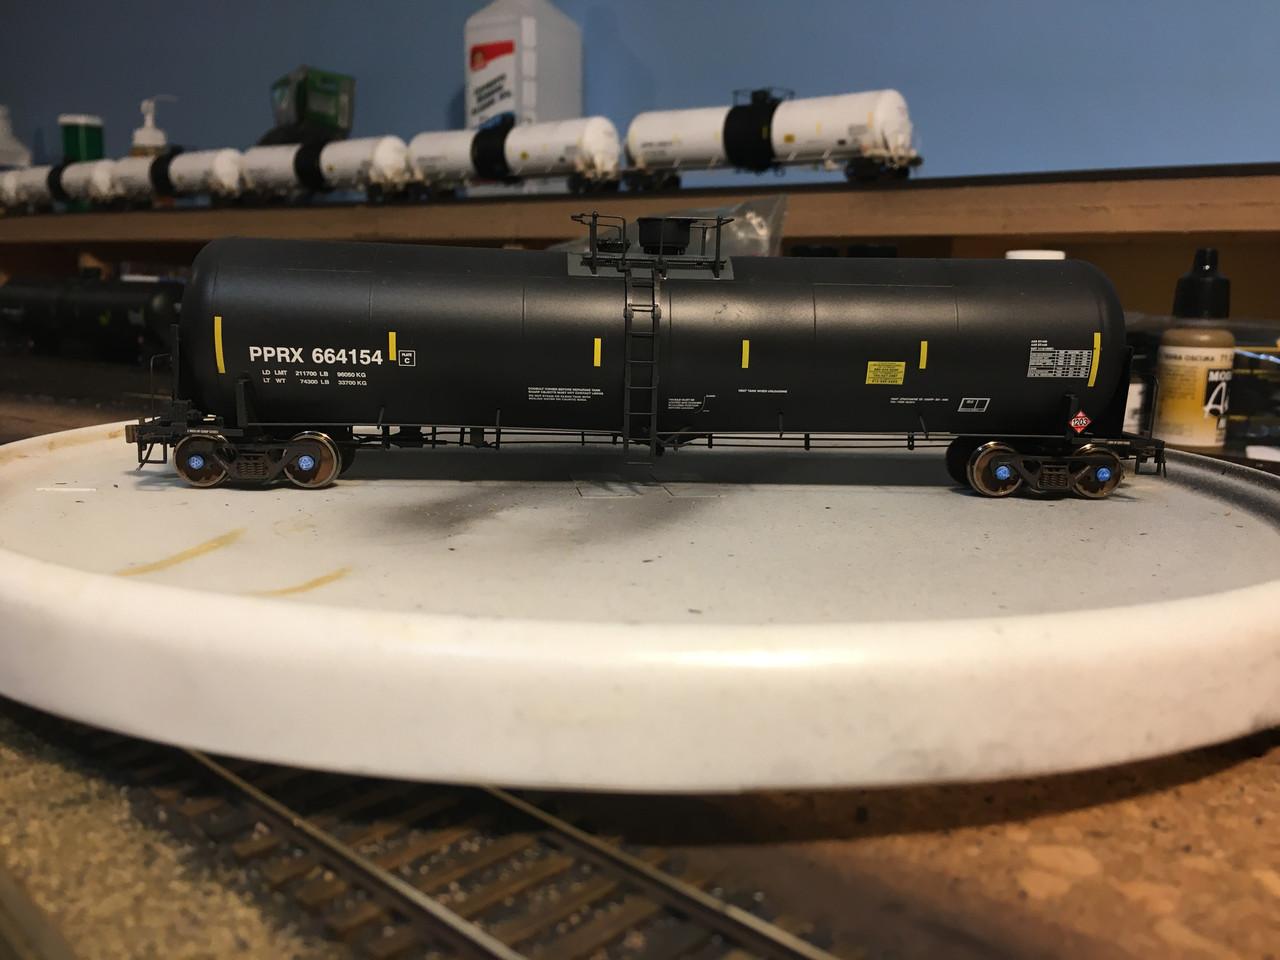 Scaletrains {SXT31642} Custom Weathered Trinity 31k Gallon Crude Oil - Phillips 66 Co. PPRX #664154 (Scale=HO) Part#8003-SXT31642w